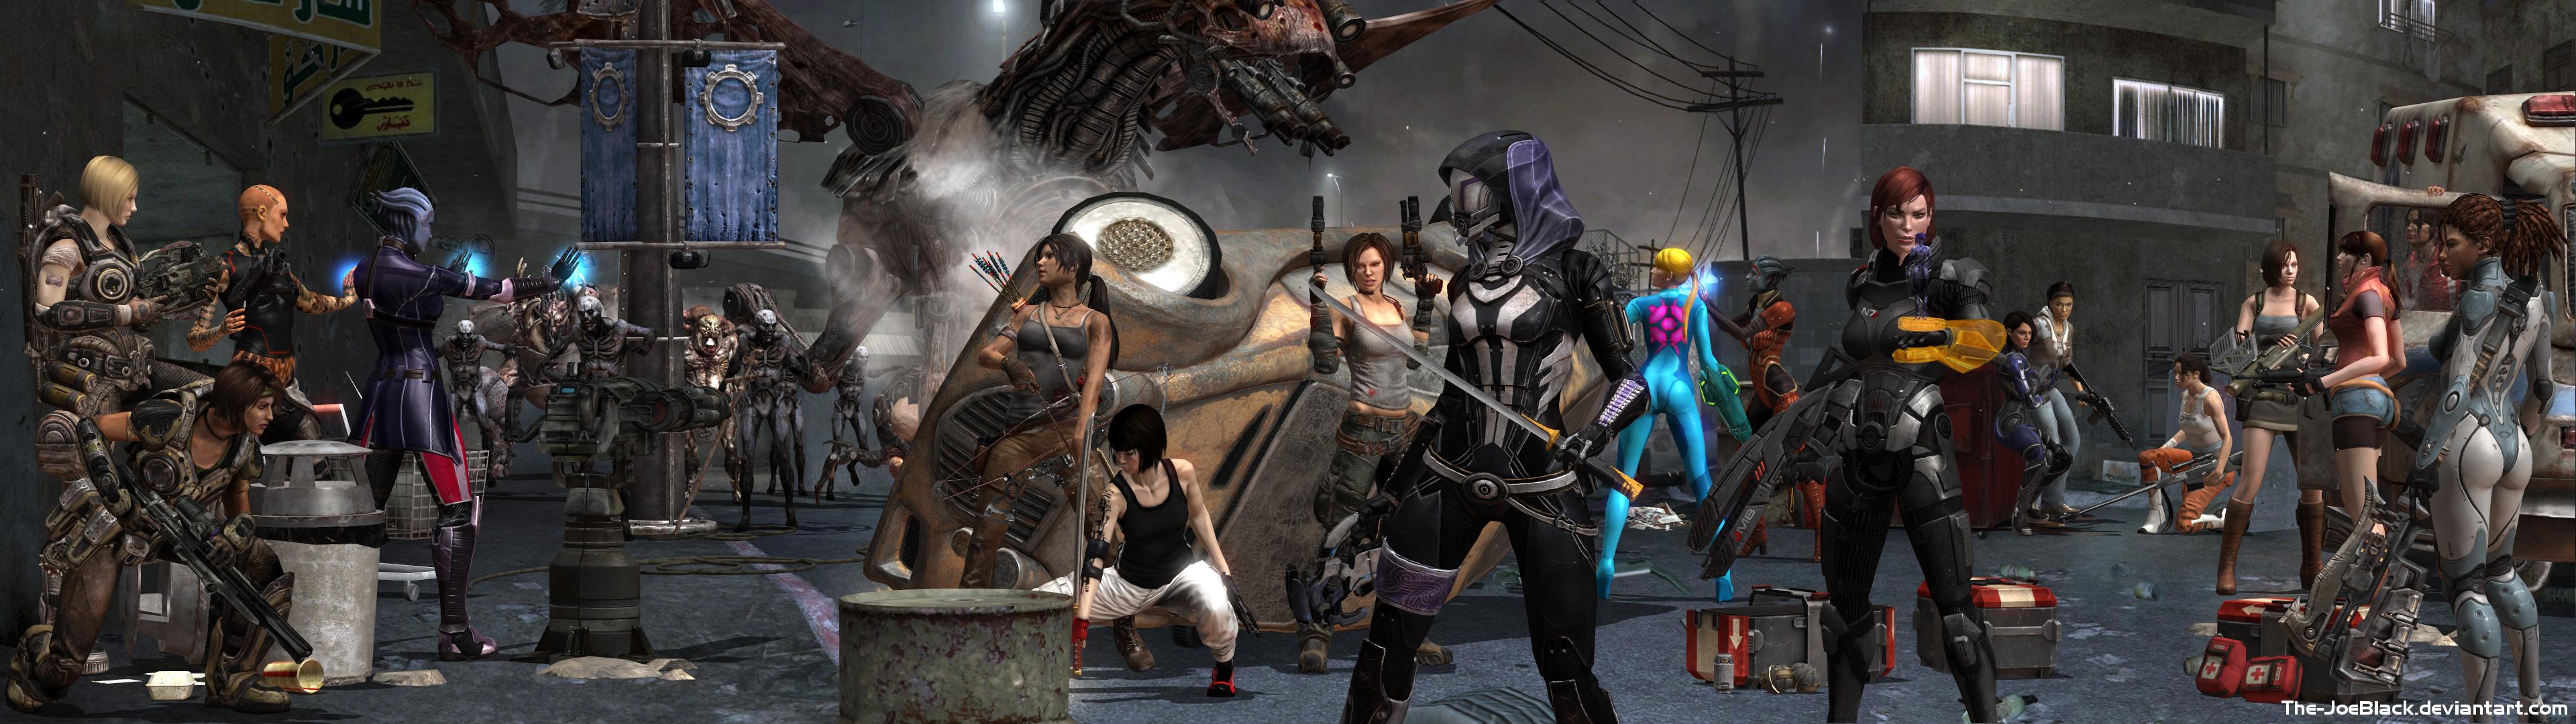 Gaming's toughest girls - Dual Screen Wallpaper by JoesHouseOfArt